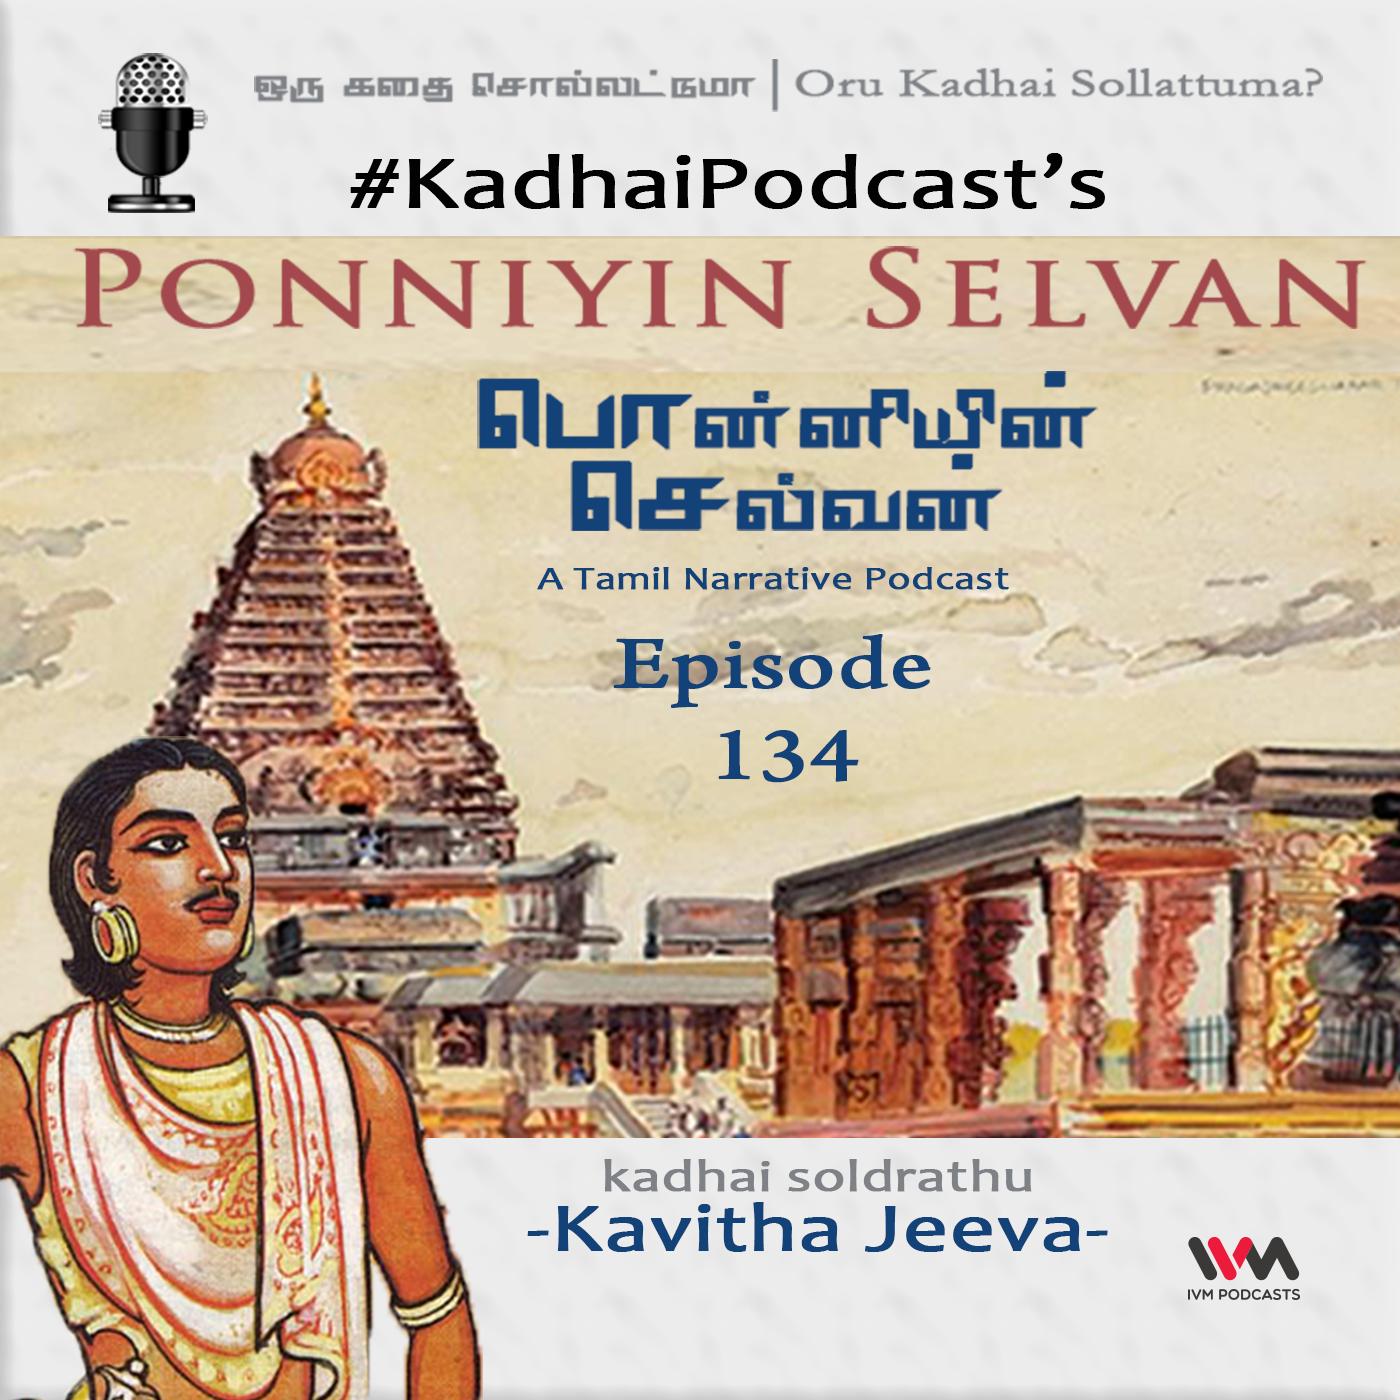 KadhaiPodcast's Ponniyin Selvan - Episode # 134